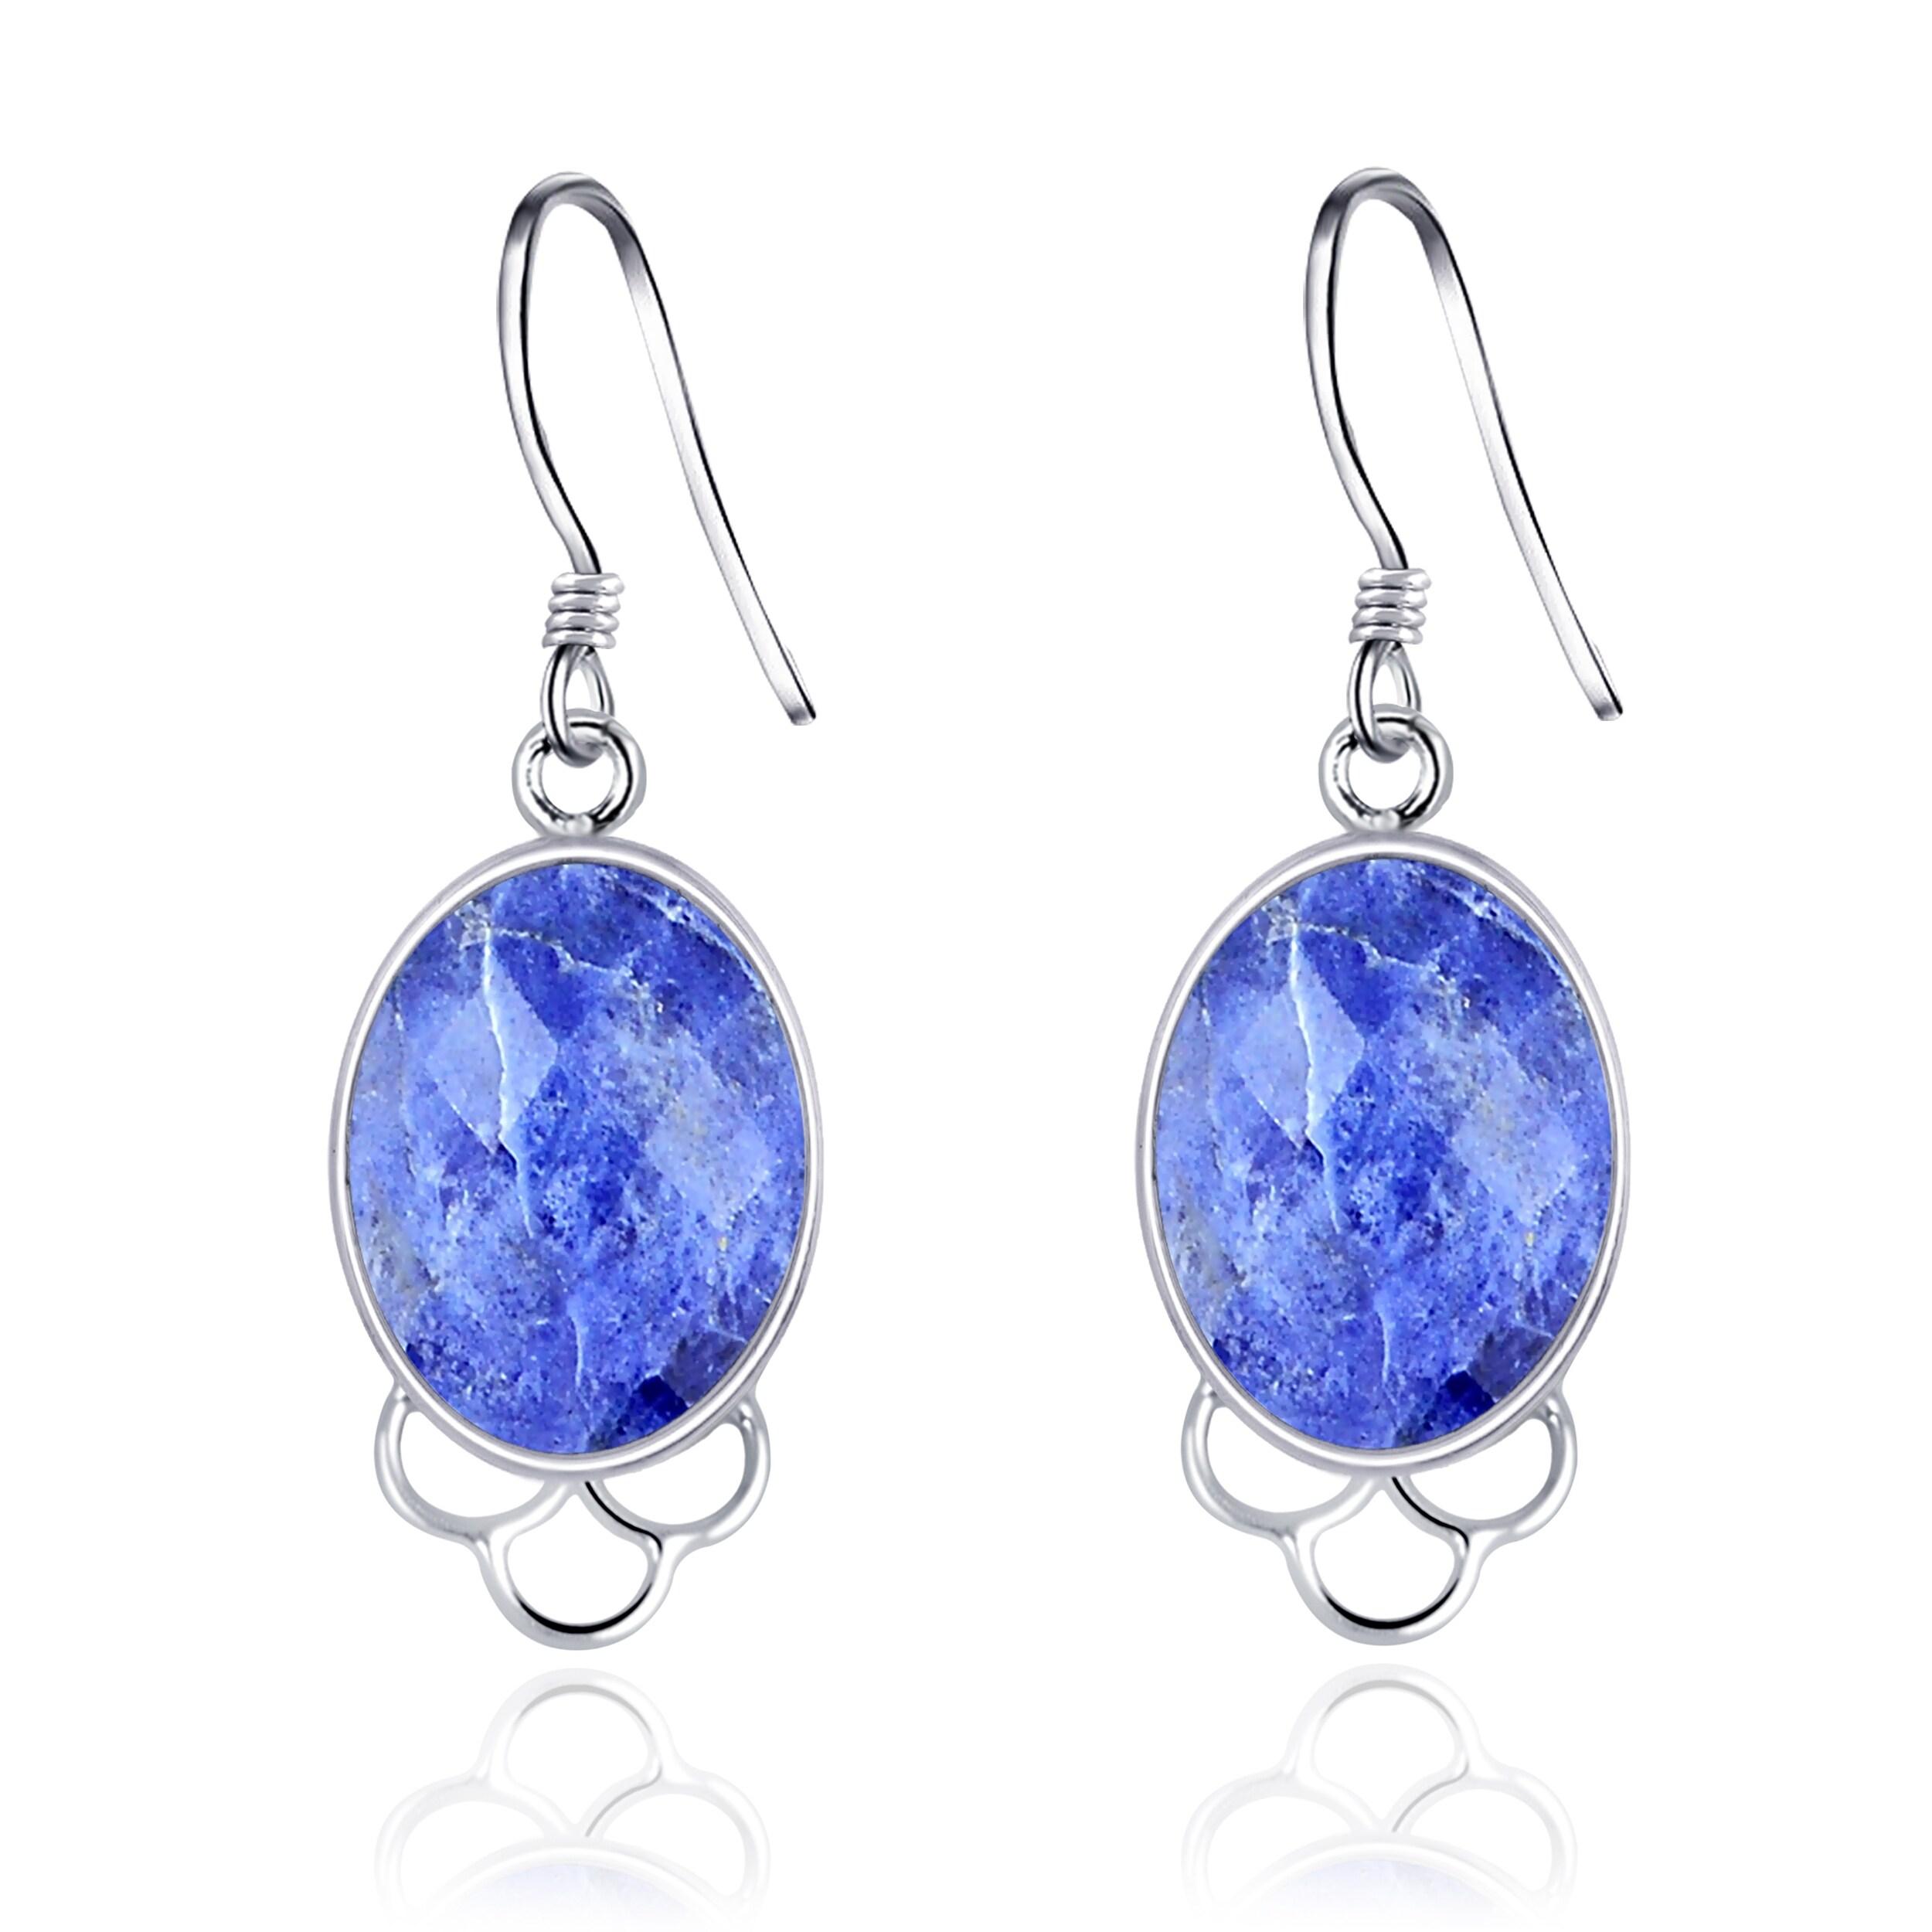 Sodalite and Sterling Silver Teardrop Charm Earrings